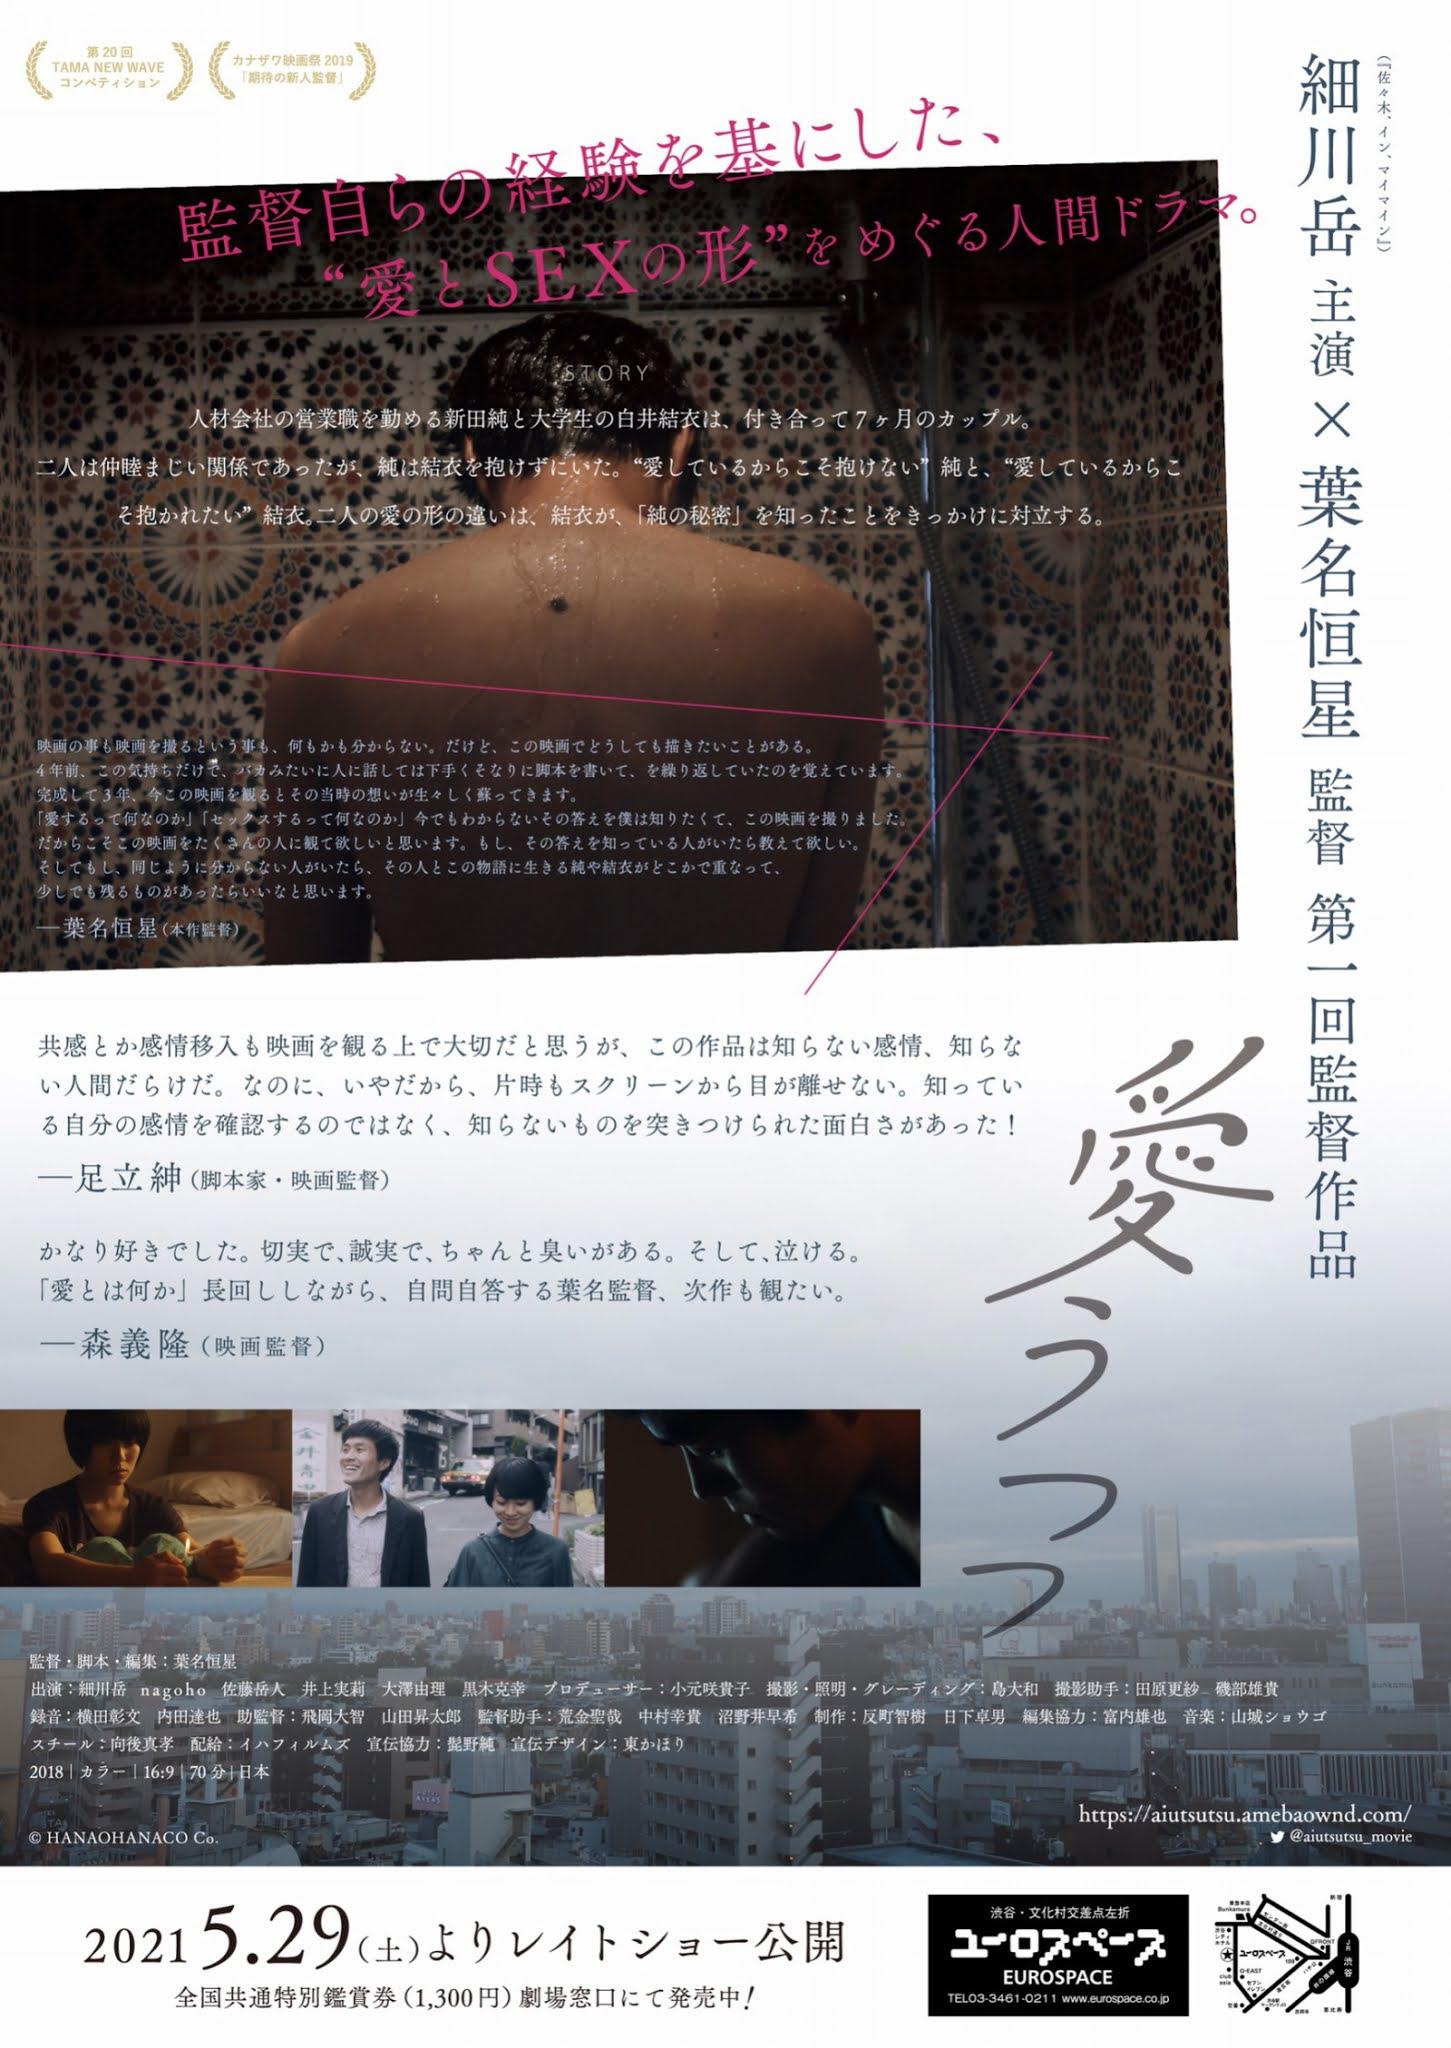 Love in all Actuality (Ai Utsutsu) film - Kosei Hana